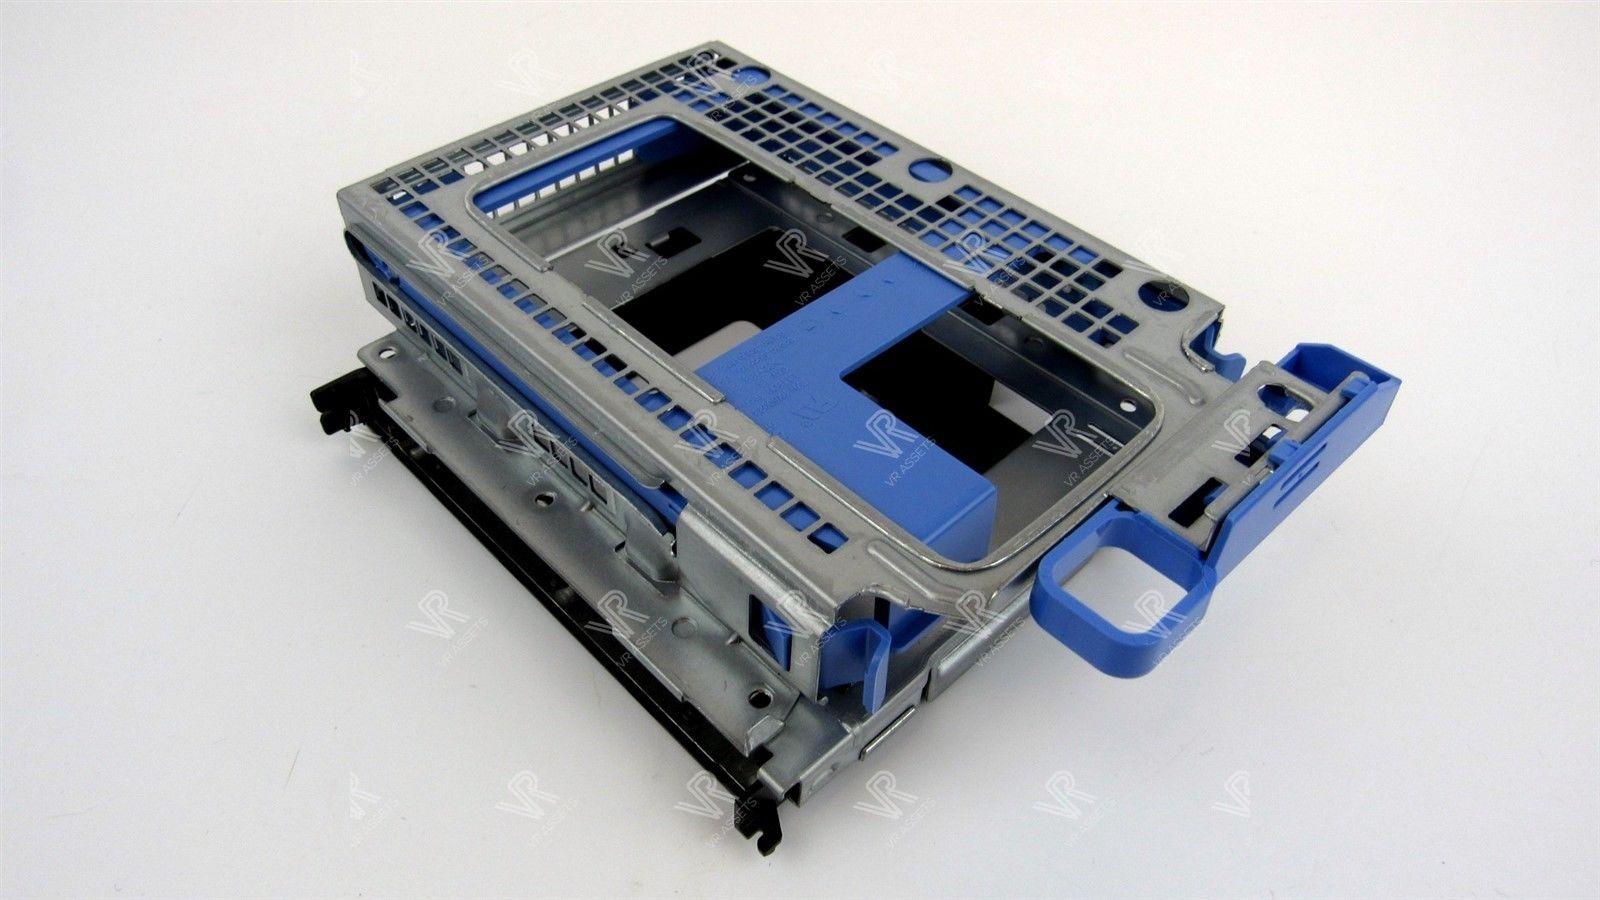 Dell Optiplex 3020 7020 9020 Desktop Hard Drive Cage Caddy 3 5